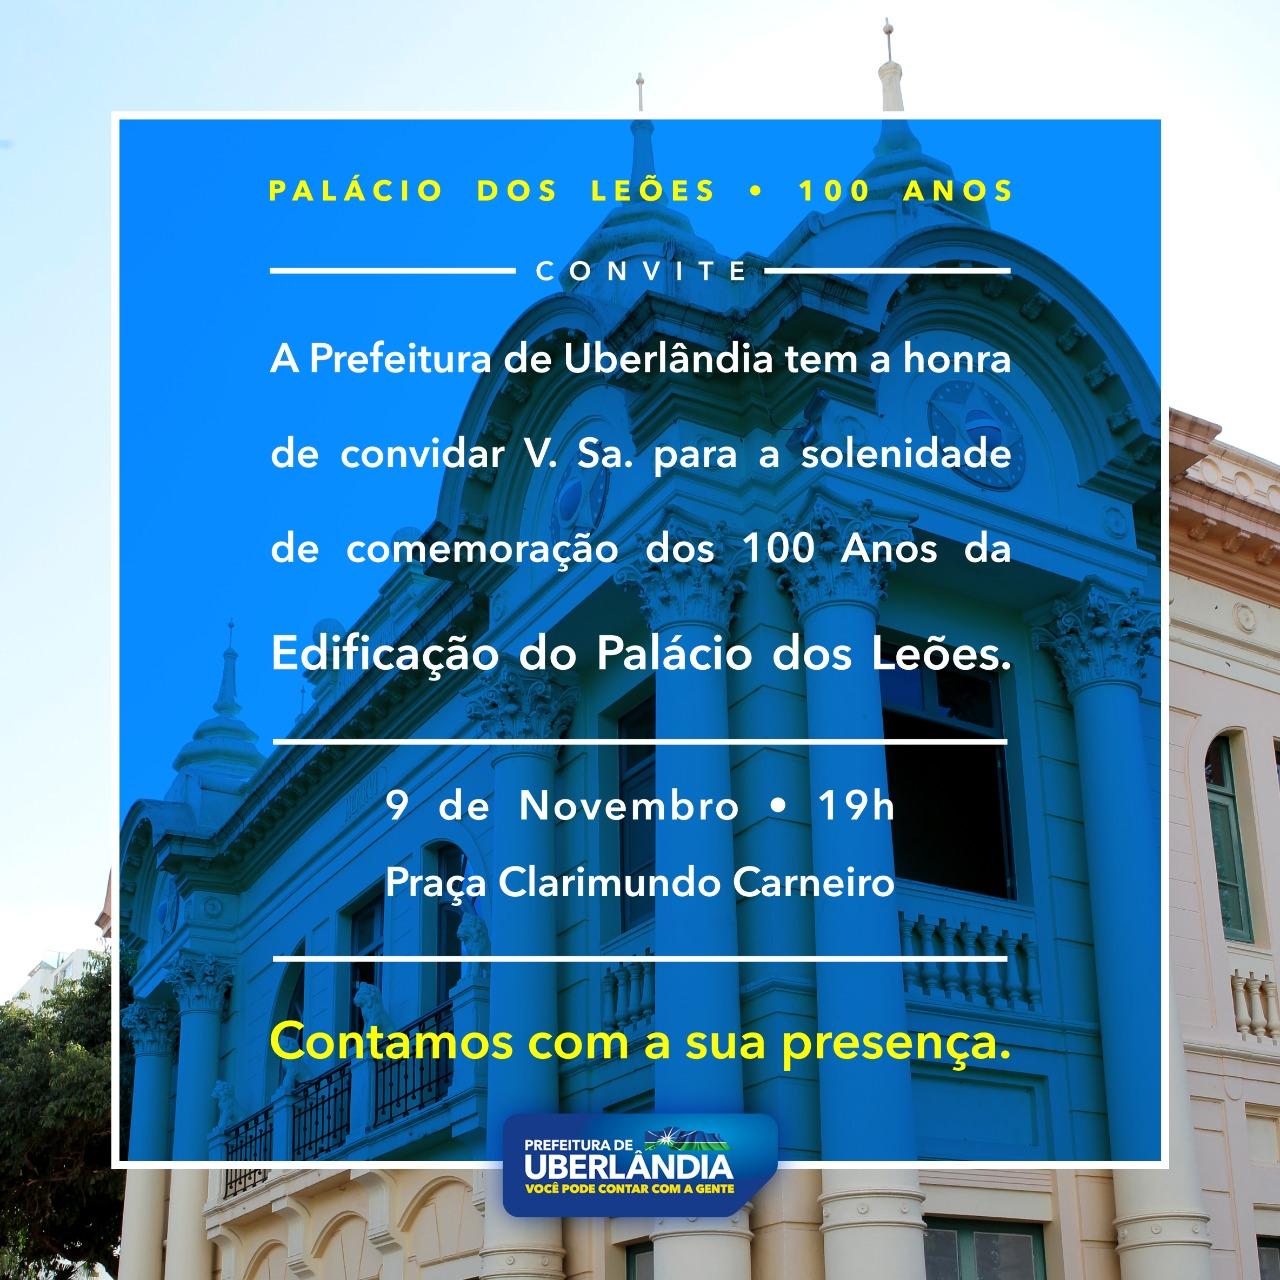 PATRIMÔNIO CULTURAL DE UBERLÂNDIA